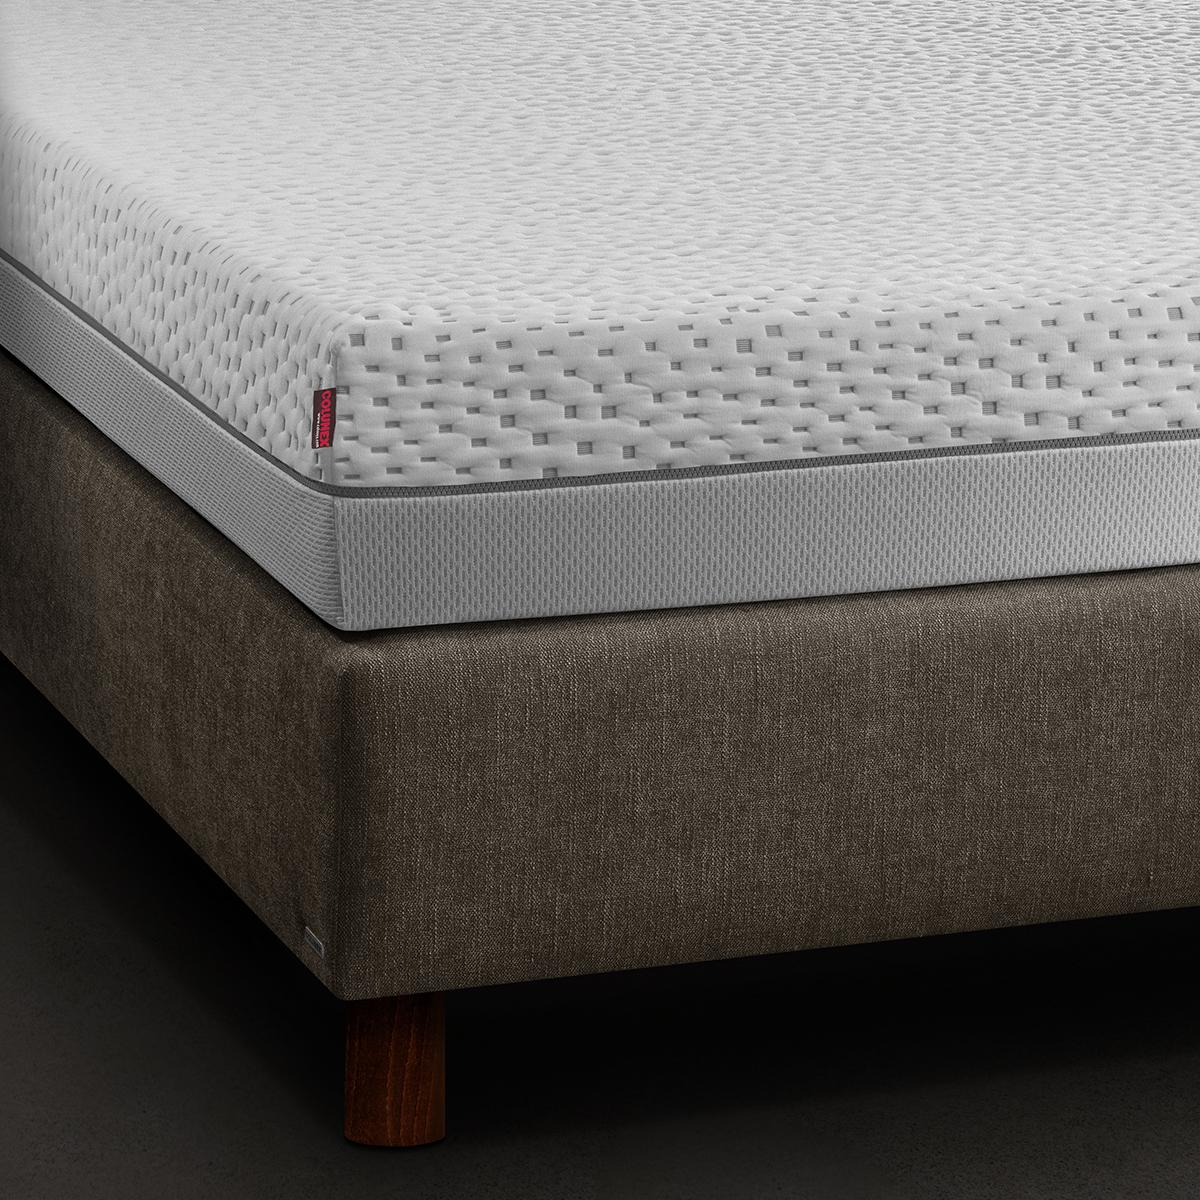 next 19 Matela Next 19 colunex next 19 mattress 01 1